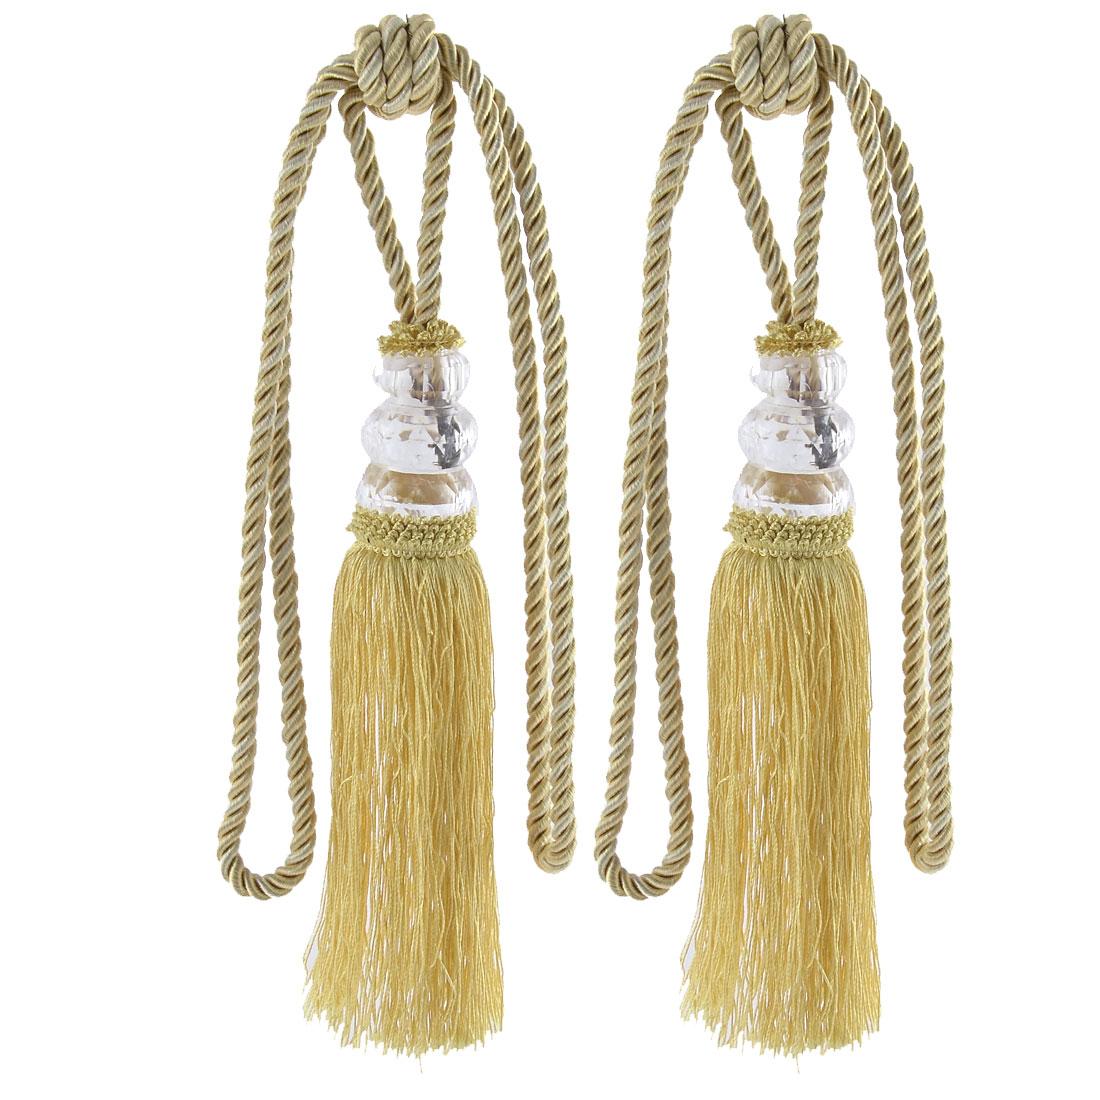 Home Plastic Bead Drapery Curtain Decoration Tassel Fringe Detail Tieback Rope Cord Golden Yellow Pair